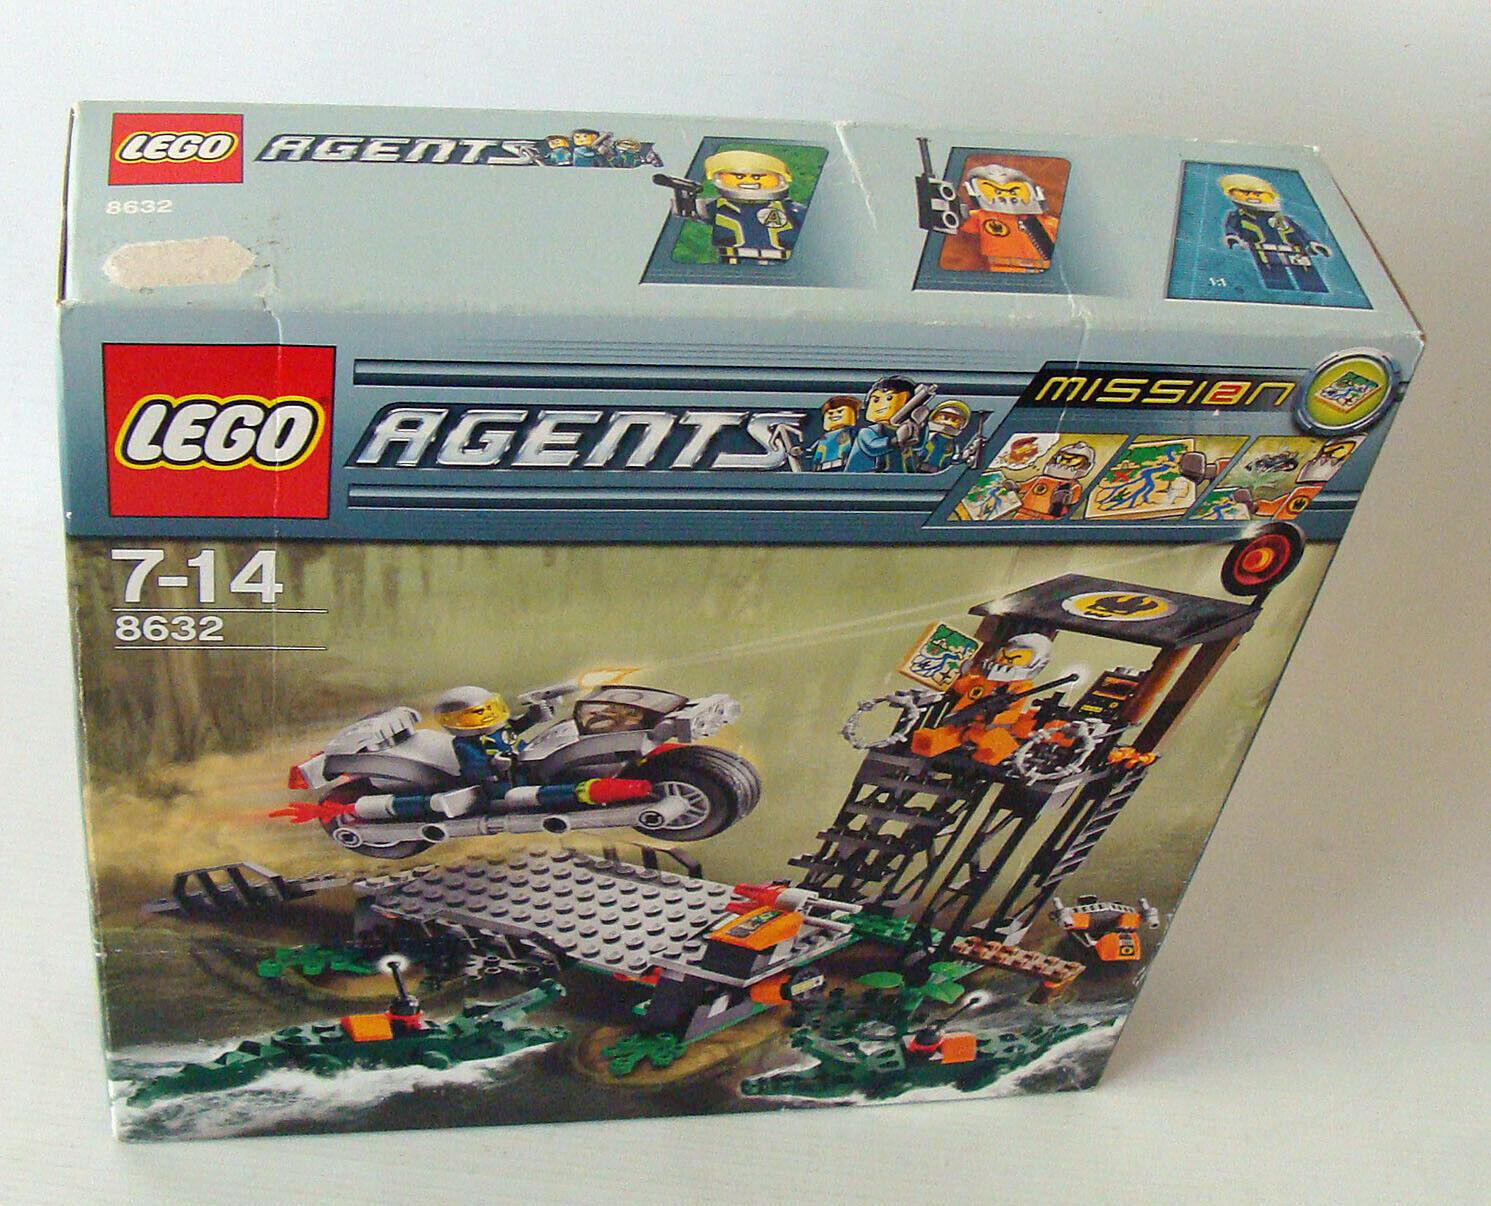 Lego® Agents Agents Agents 8632 Mission 2 - Jagd im Sumpf 7-14 Jahren 231 Teile Neu New 563185